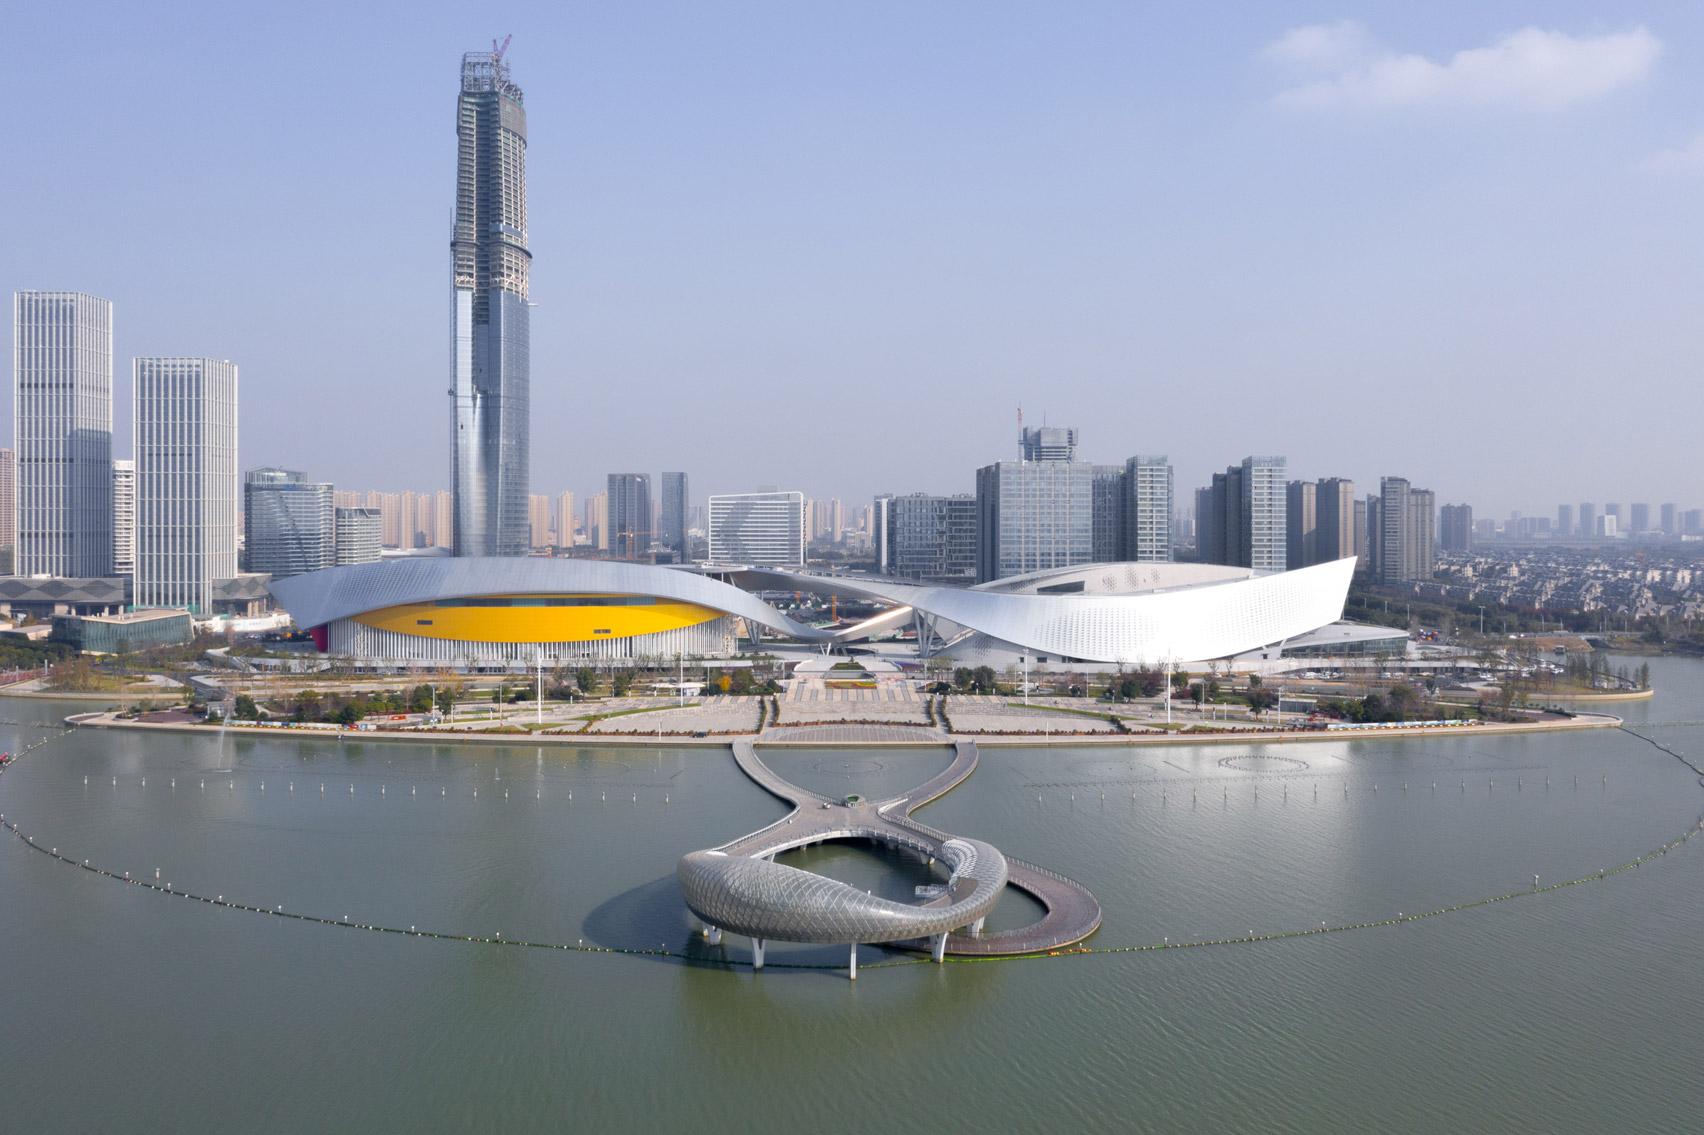 The exterior of the Suzhou Bay Cultural Center by Christian de Portzamparc